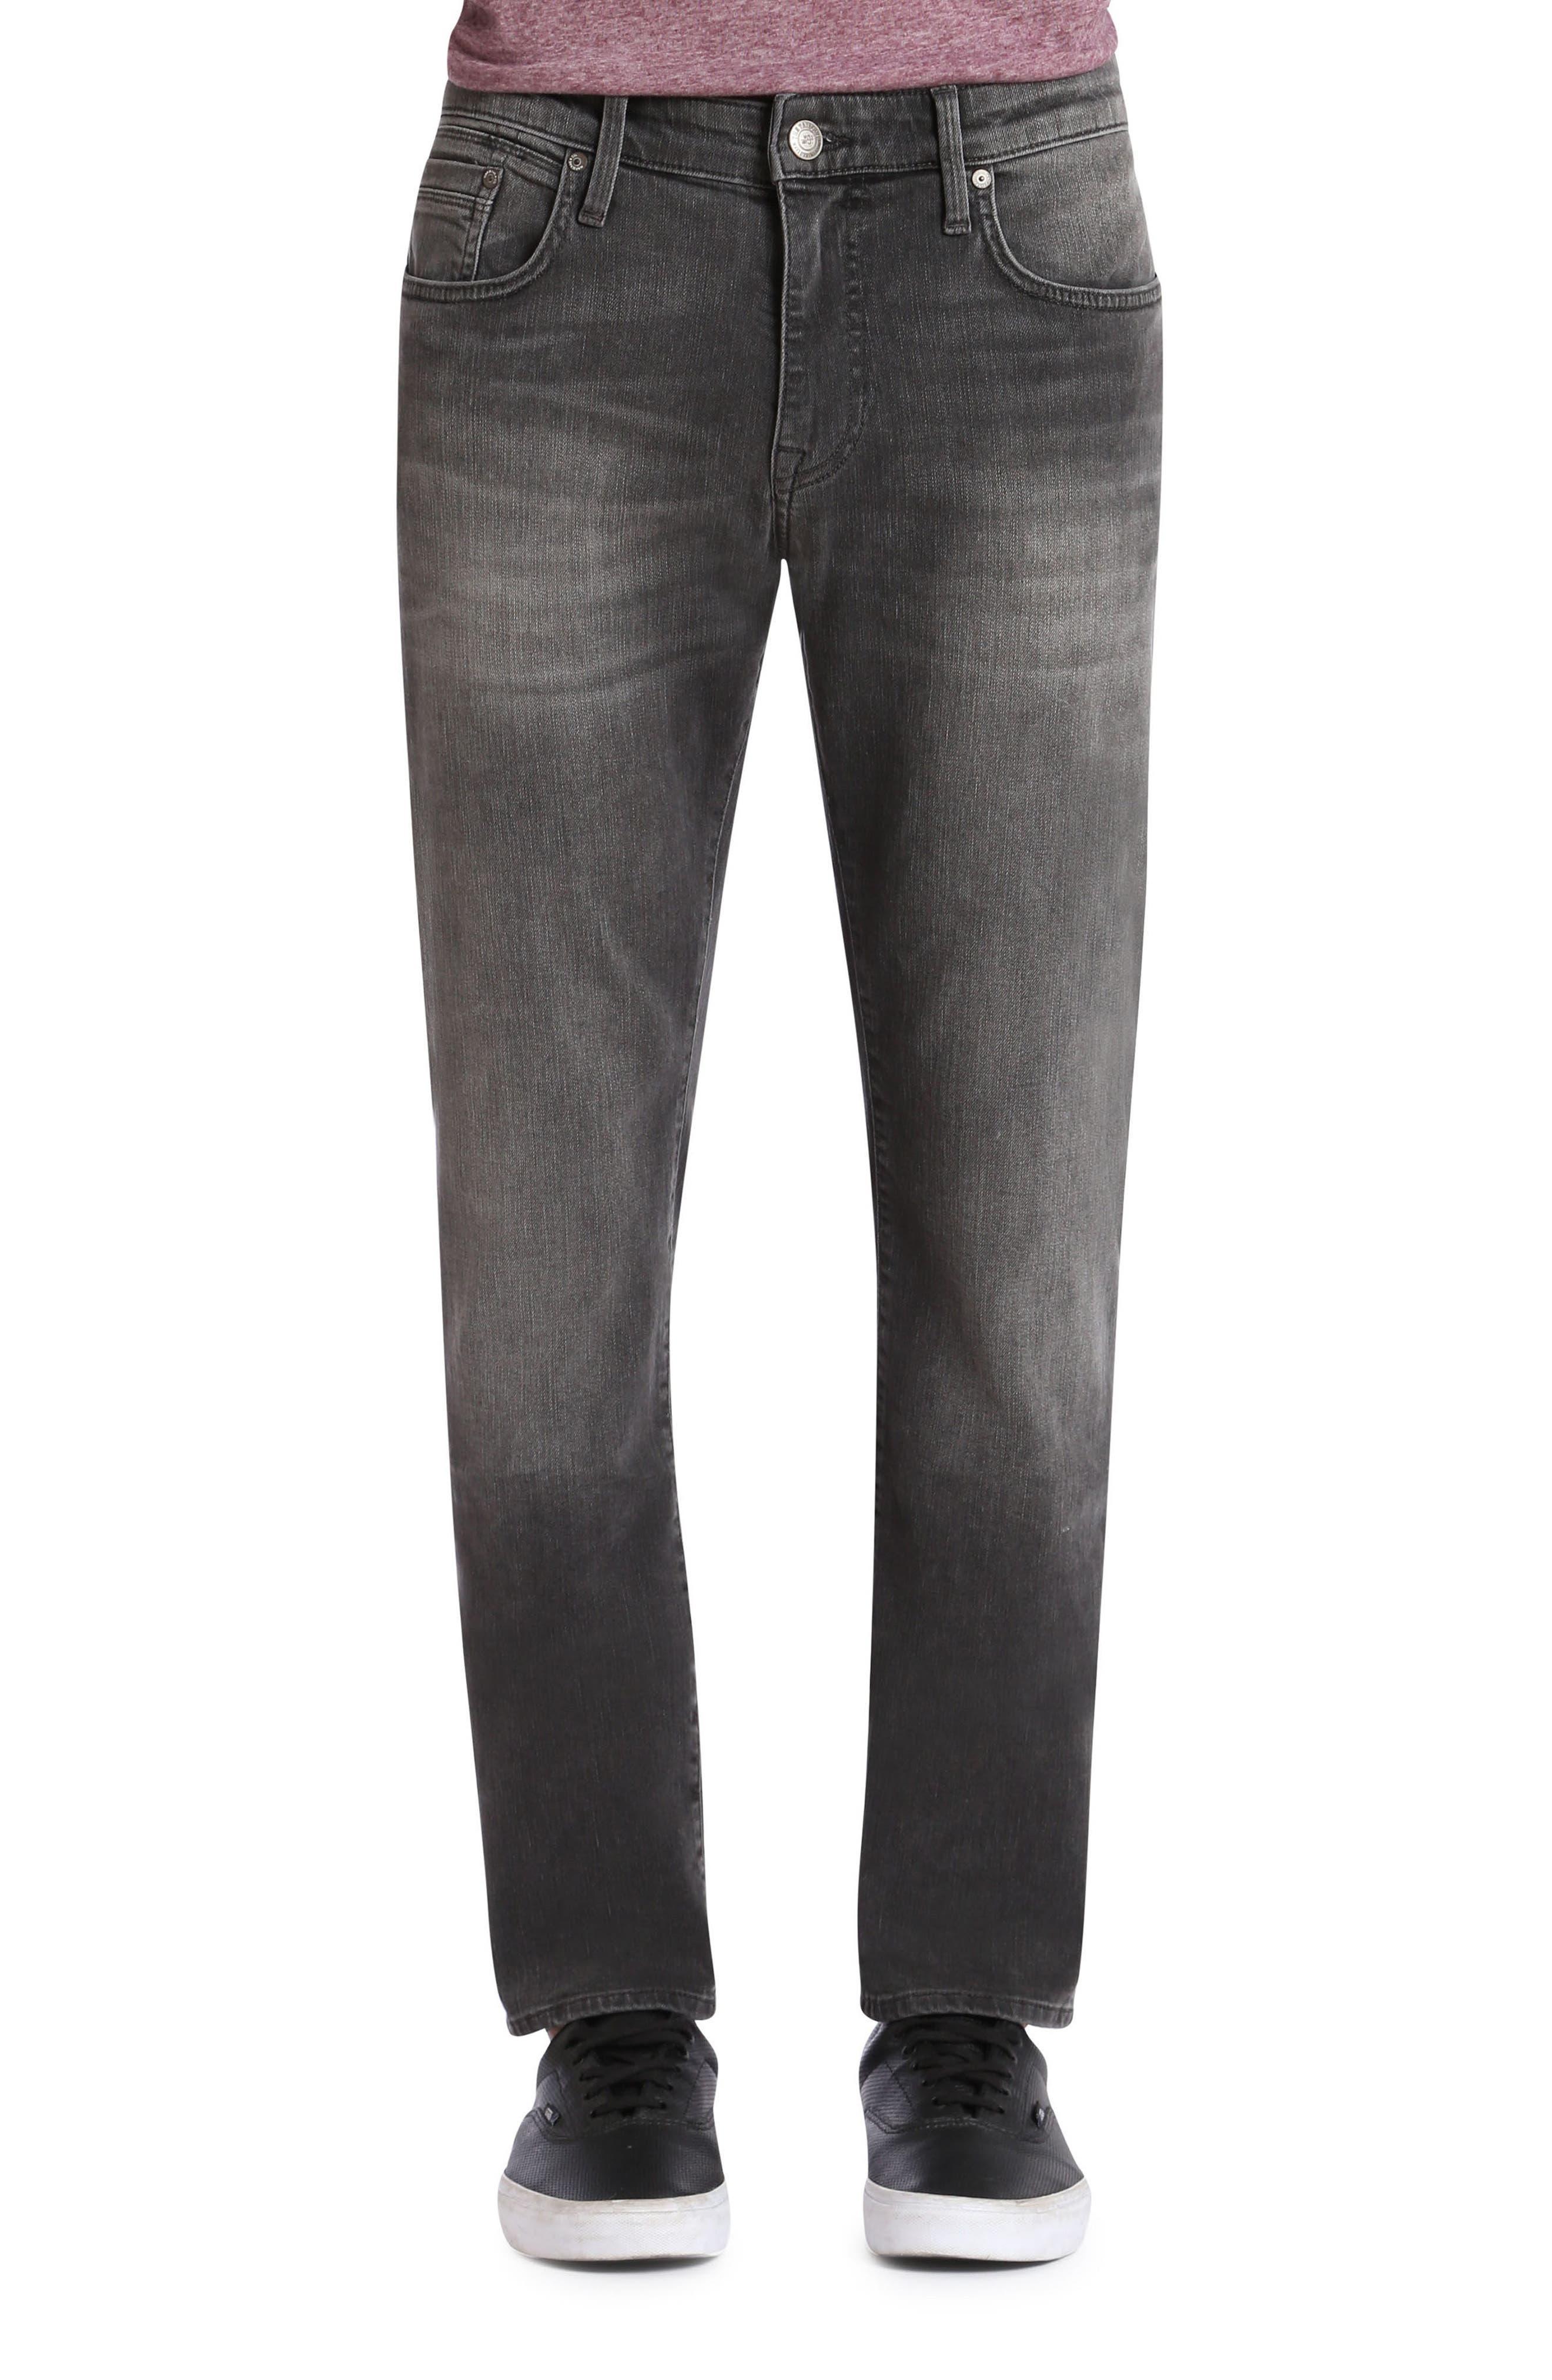 Jake Slim Fit Jeans,                         Main,                         color, Grey Distressed Williamsburg